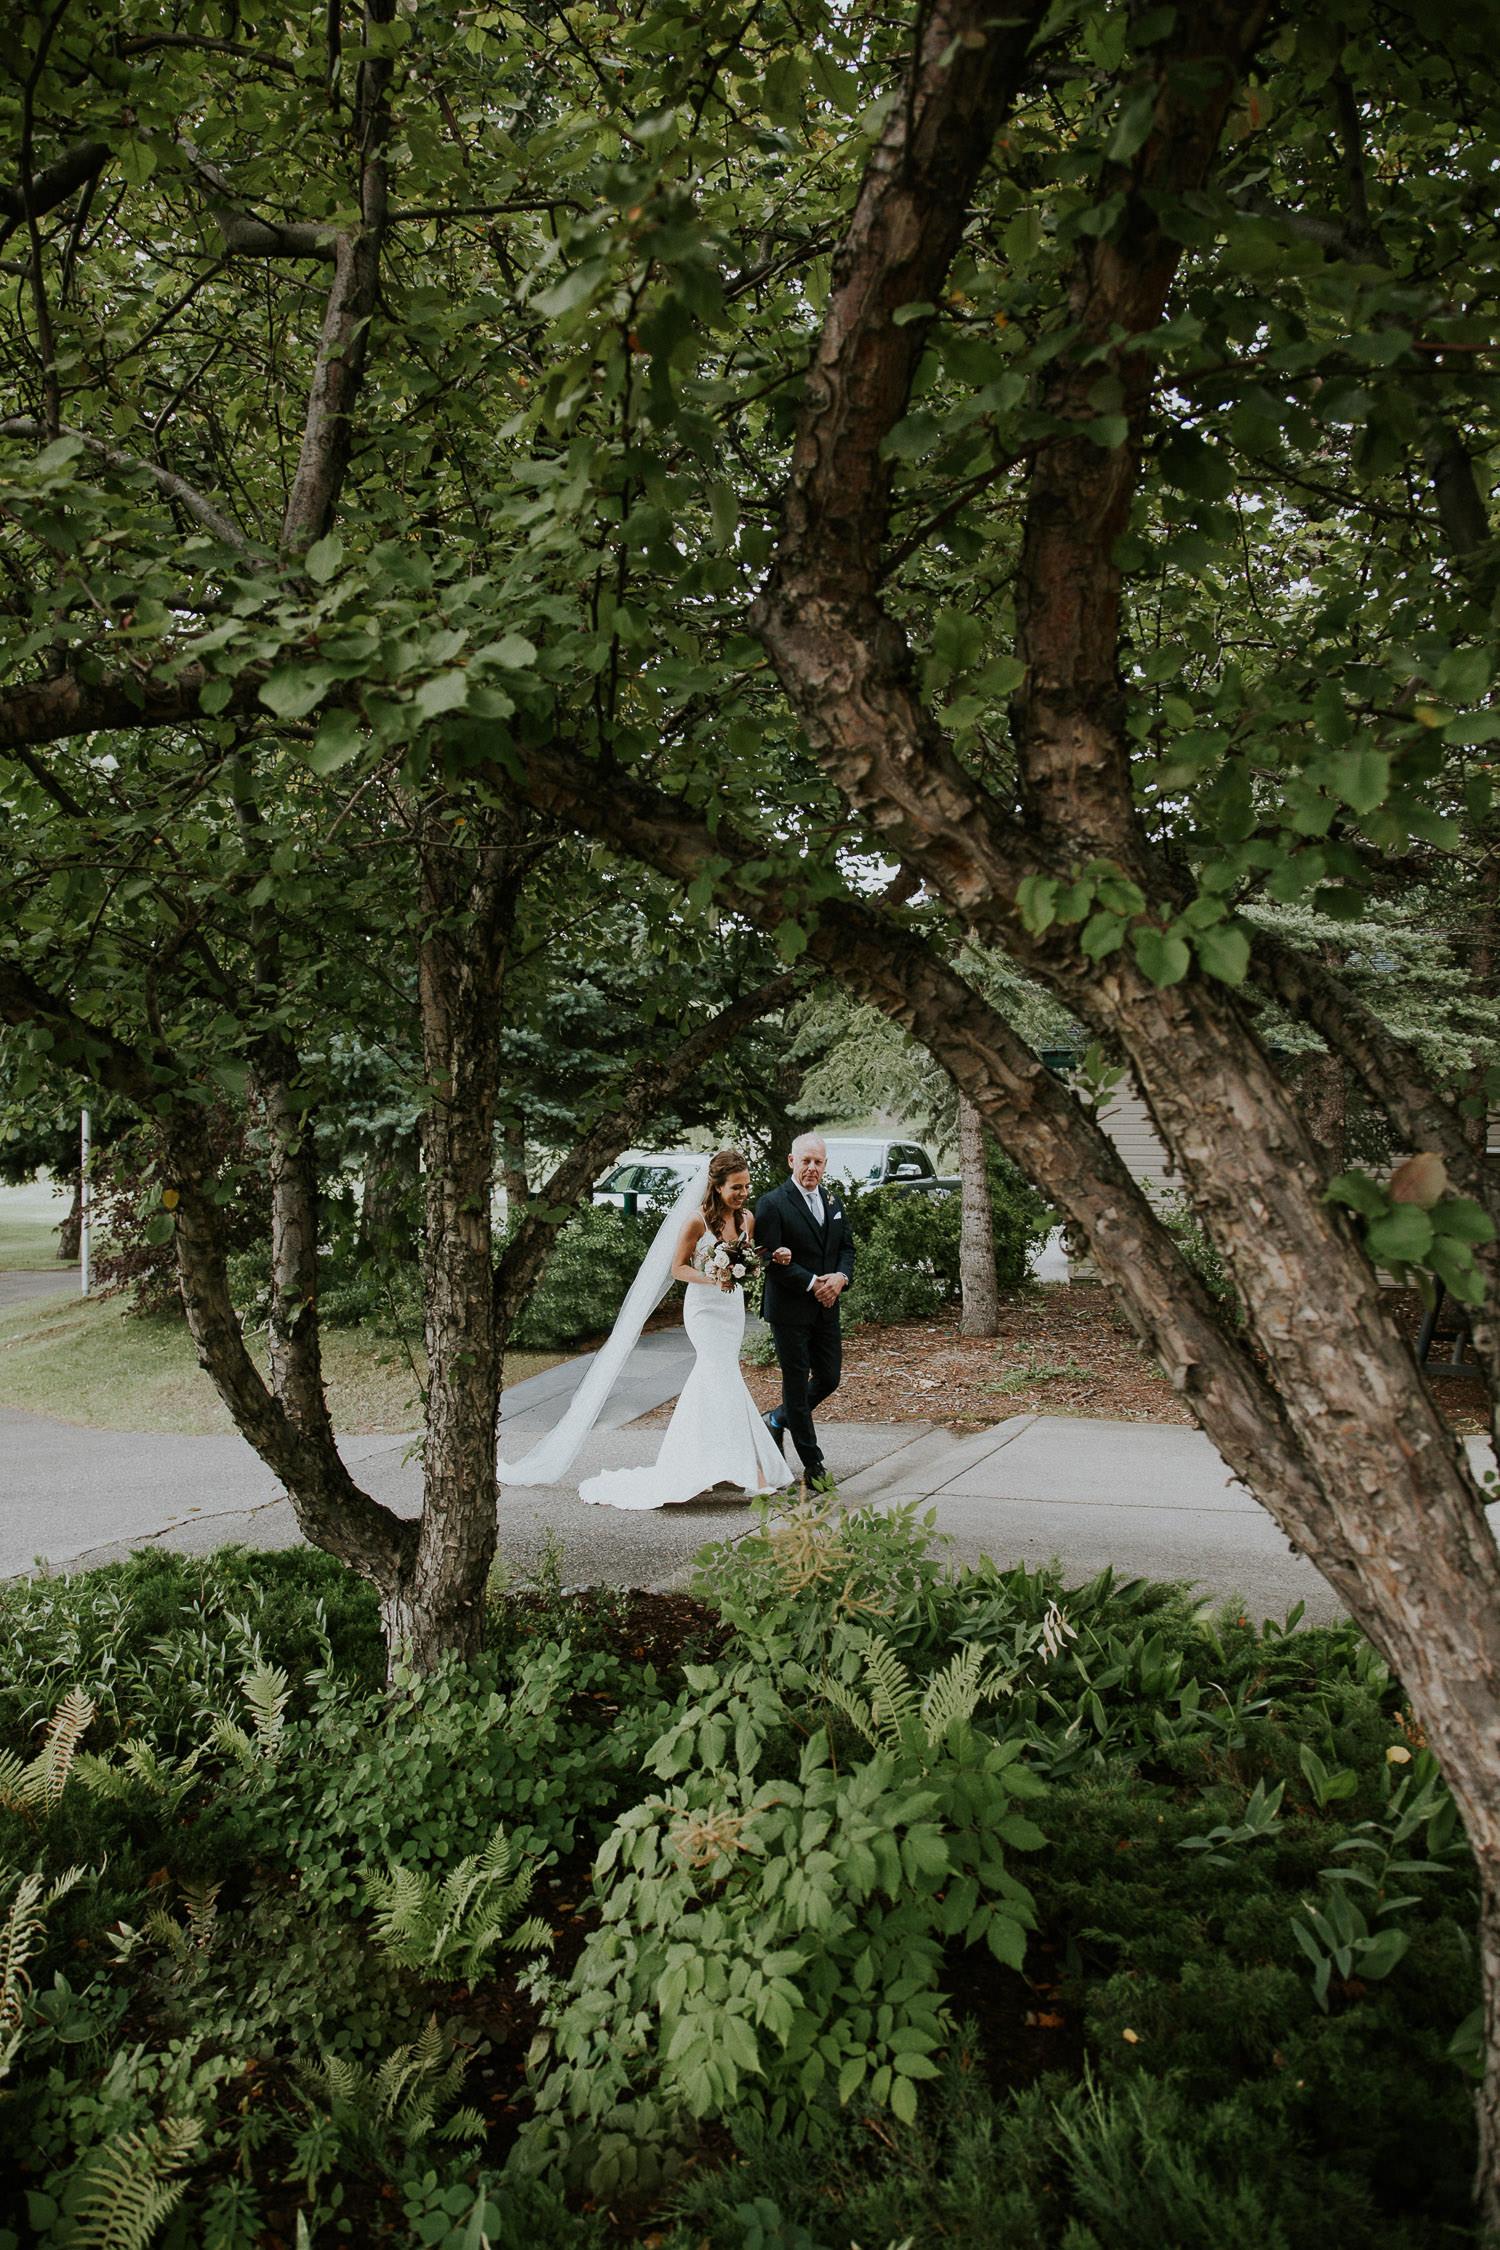 valley-ridge-golf-club-wedding-sarah-pukin-0113